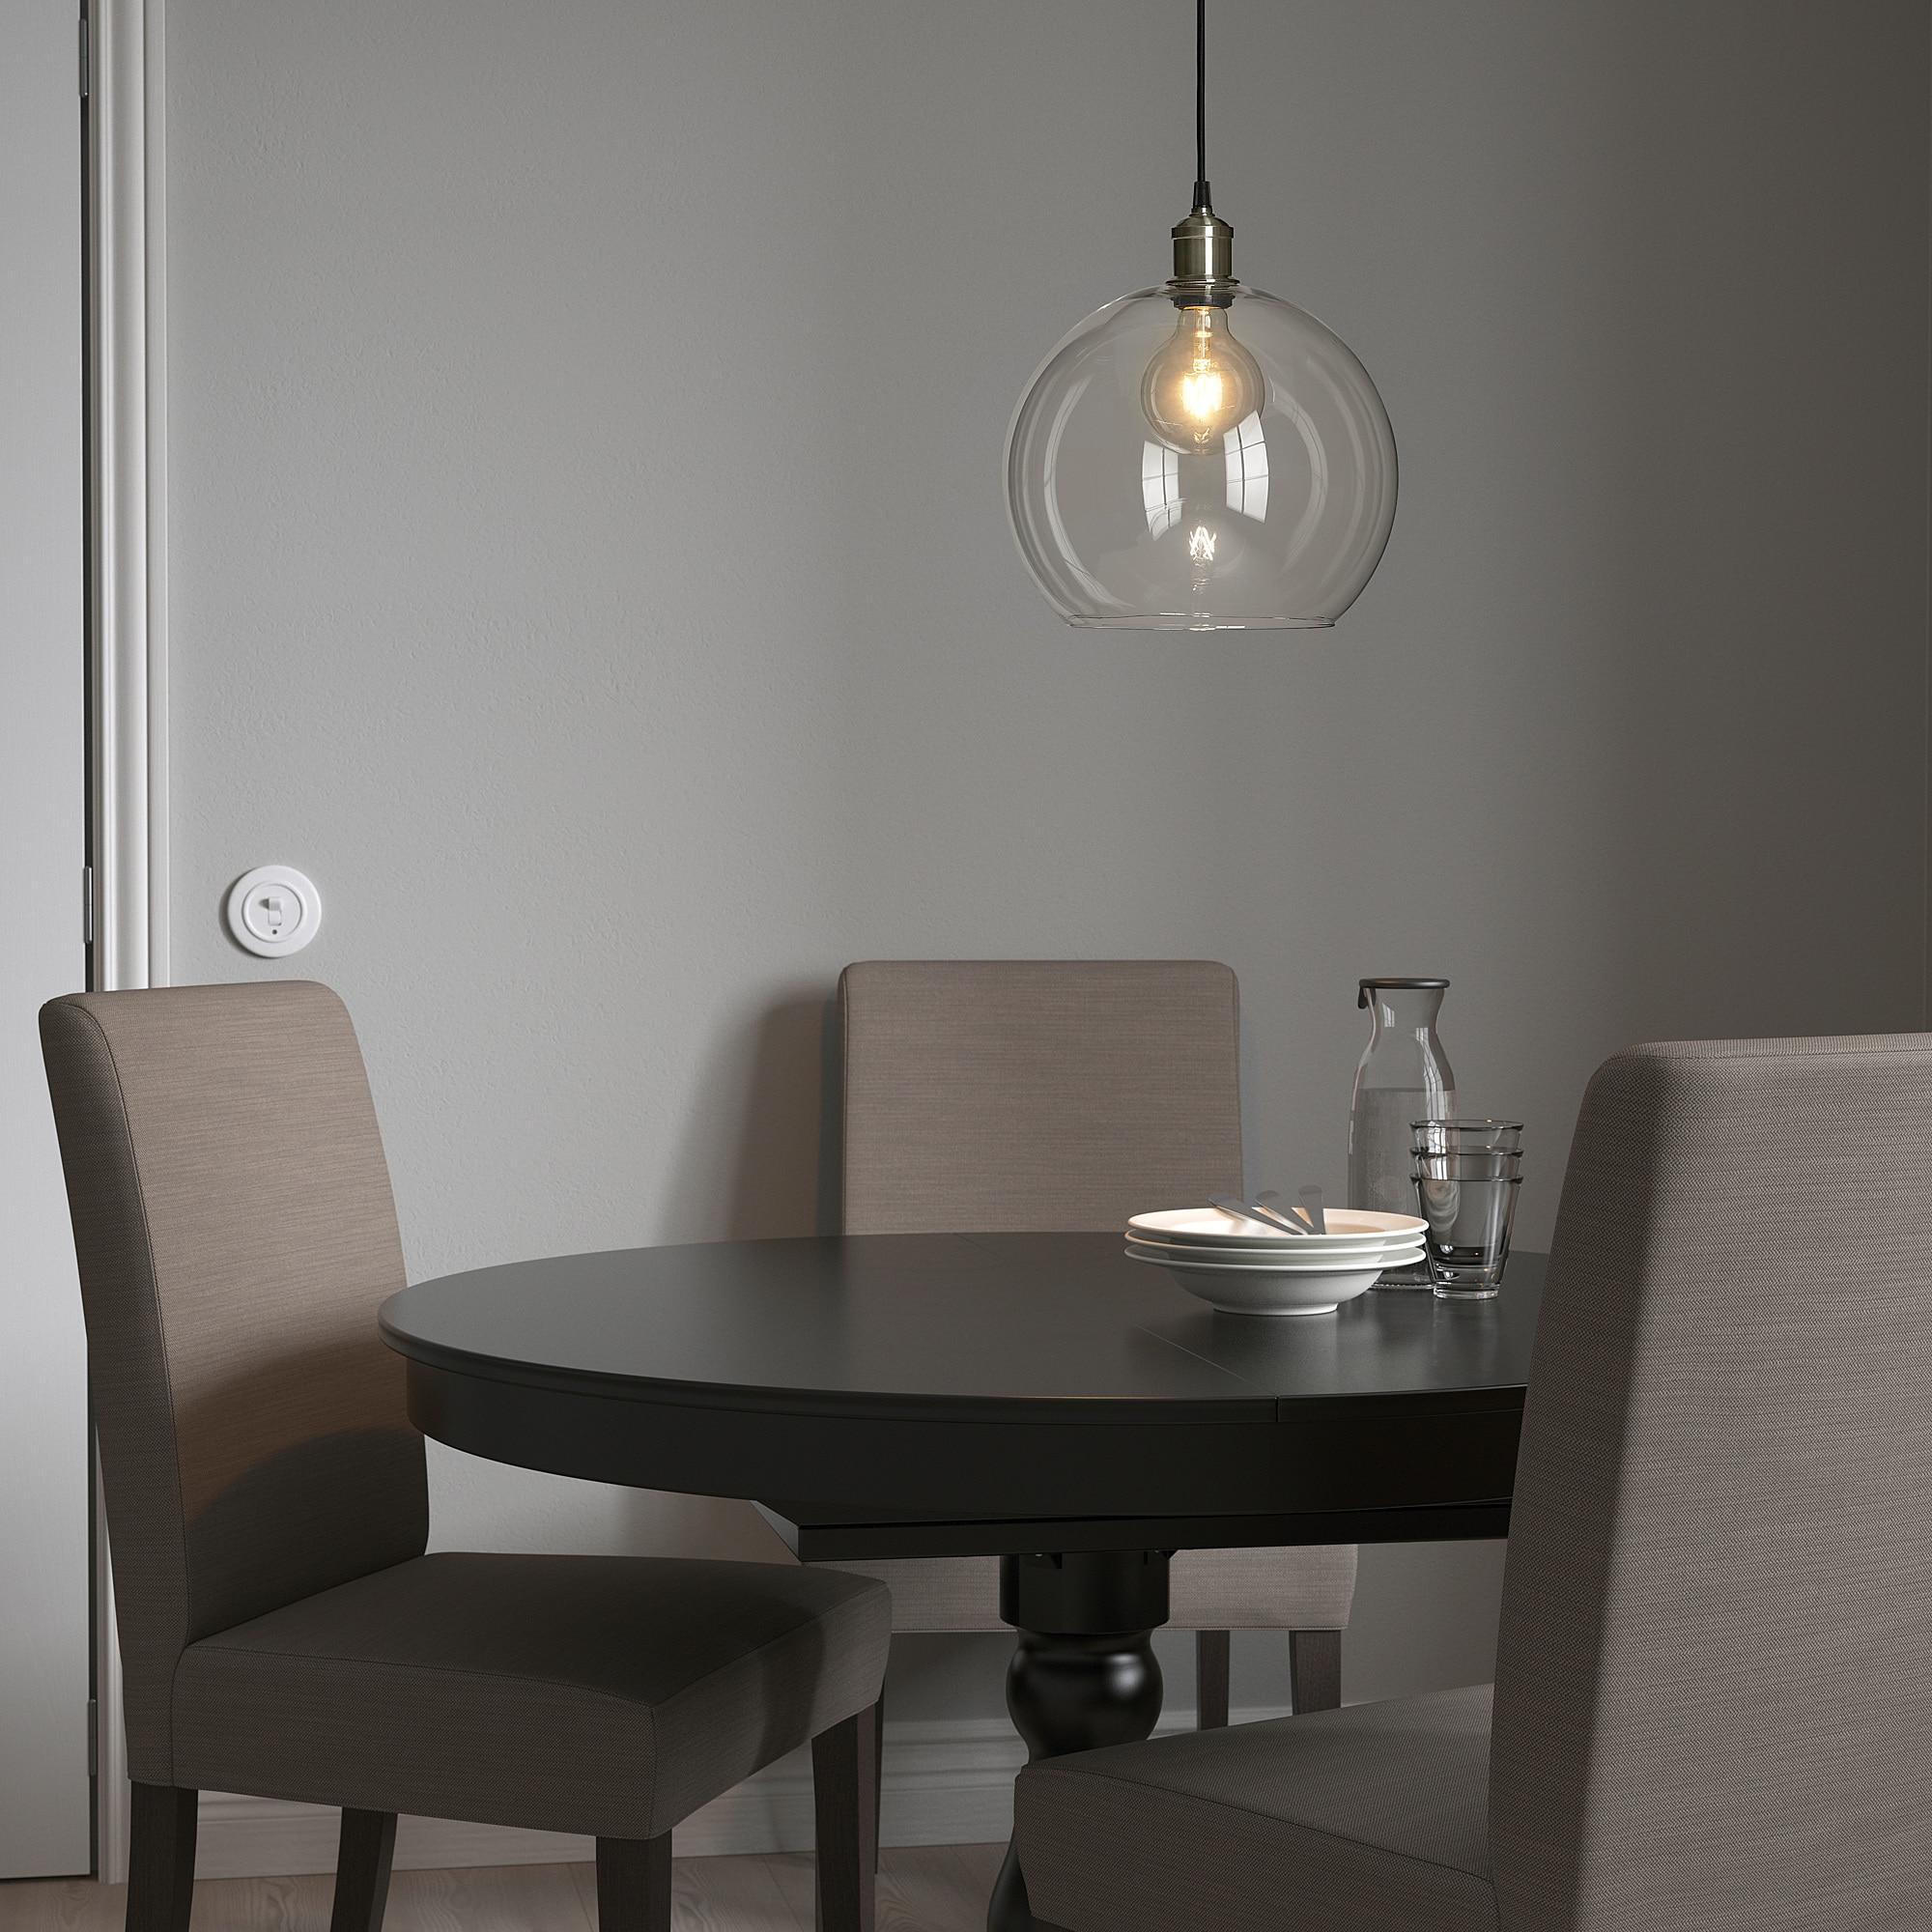 jakobsbyn-pendant-lamp-shade-clear-glass__0914236_pe789956_s5.jpg?f=g